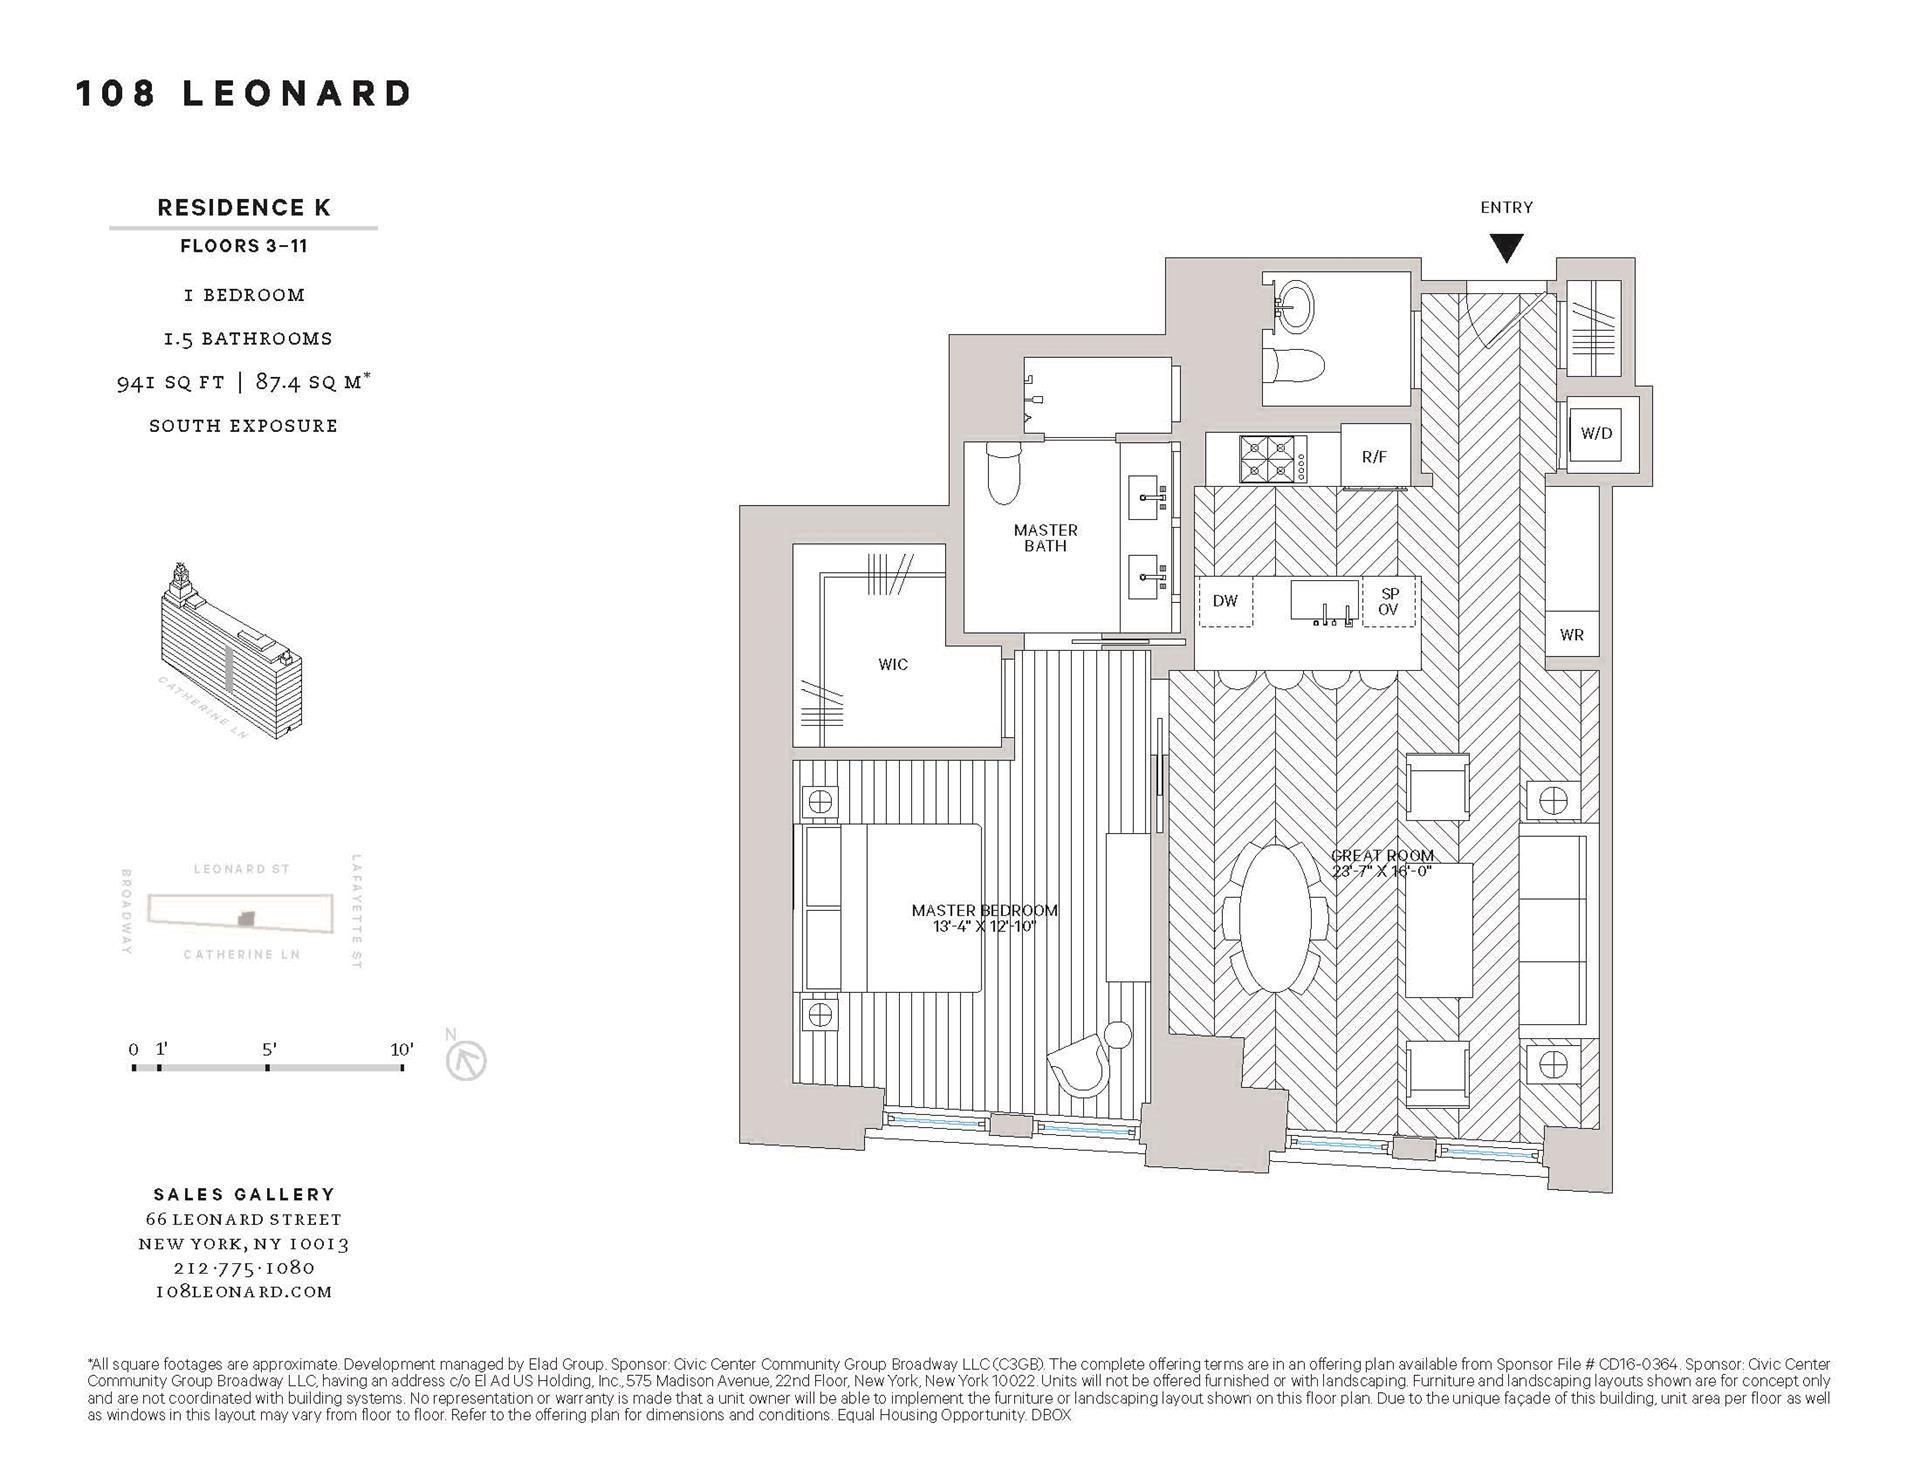 Floor plan of 108 Leonard St, 7K - TriBeCa, New York